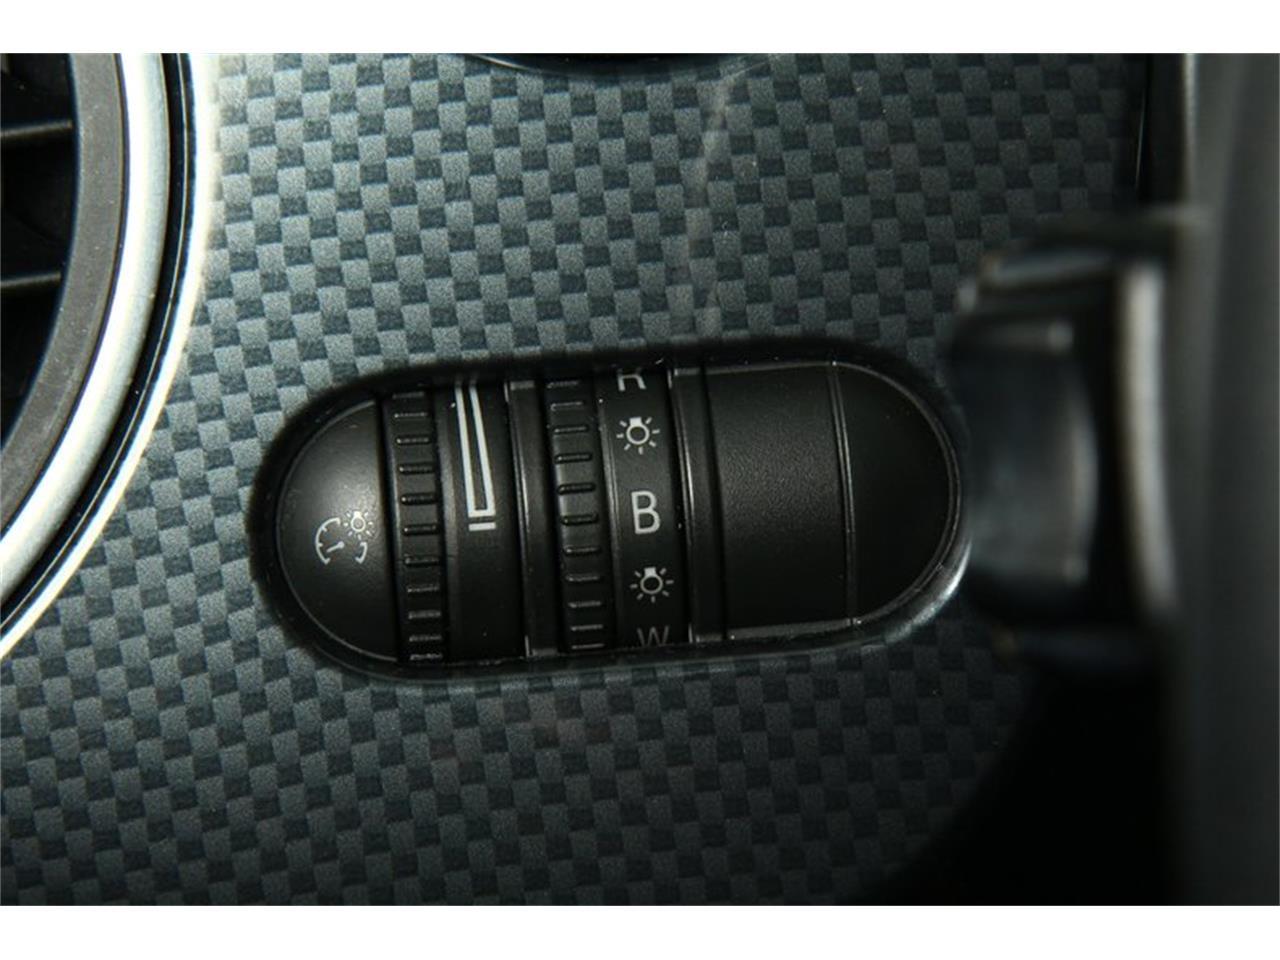 2012 Volkswagen Beetle (CC-1390844) for sale in Elyria, Ohio